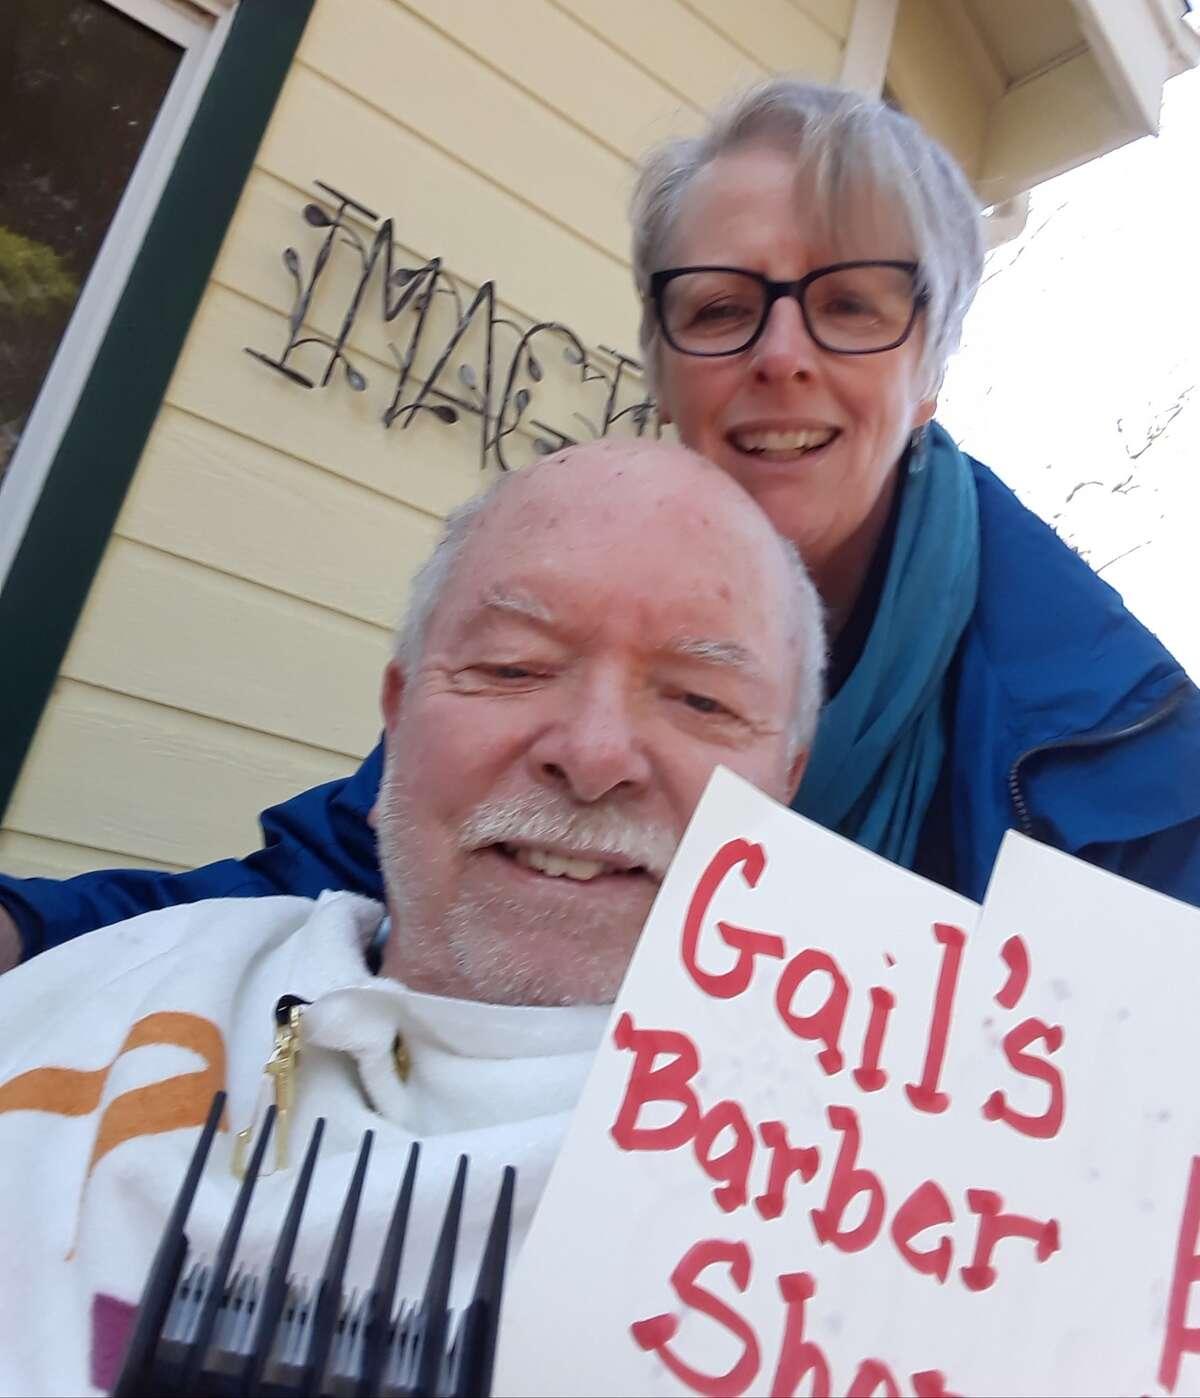 """My husband and I set up our own barber shop/salon!"" said Gail VanTassell."